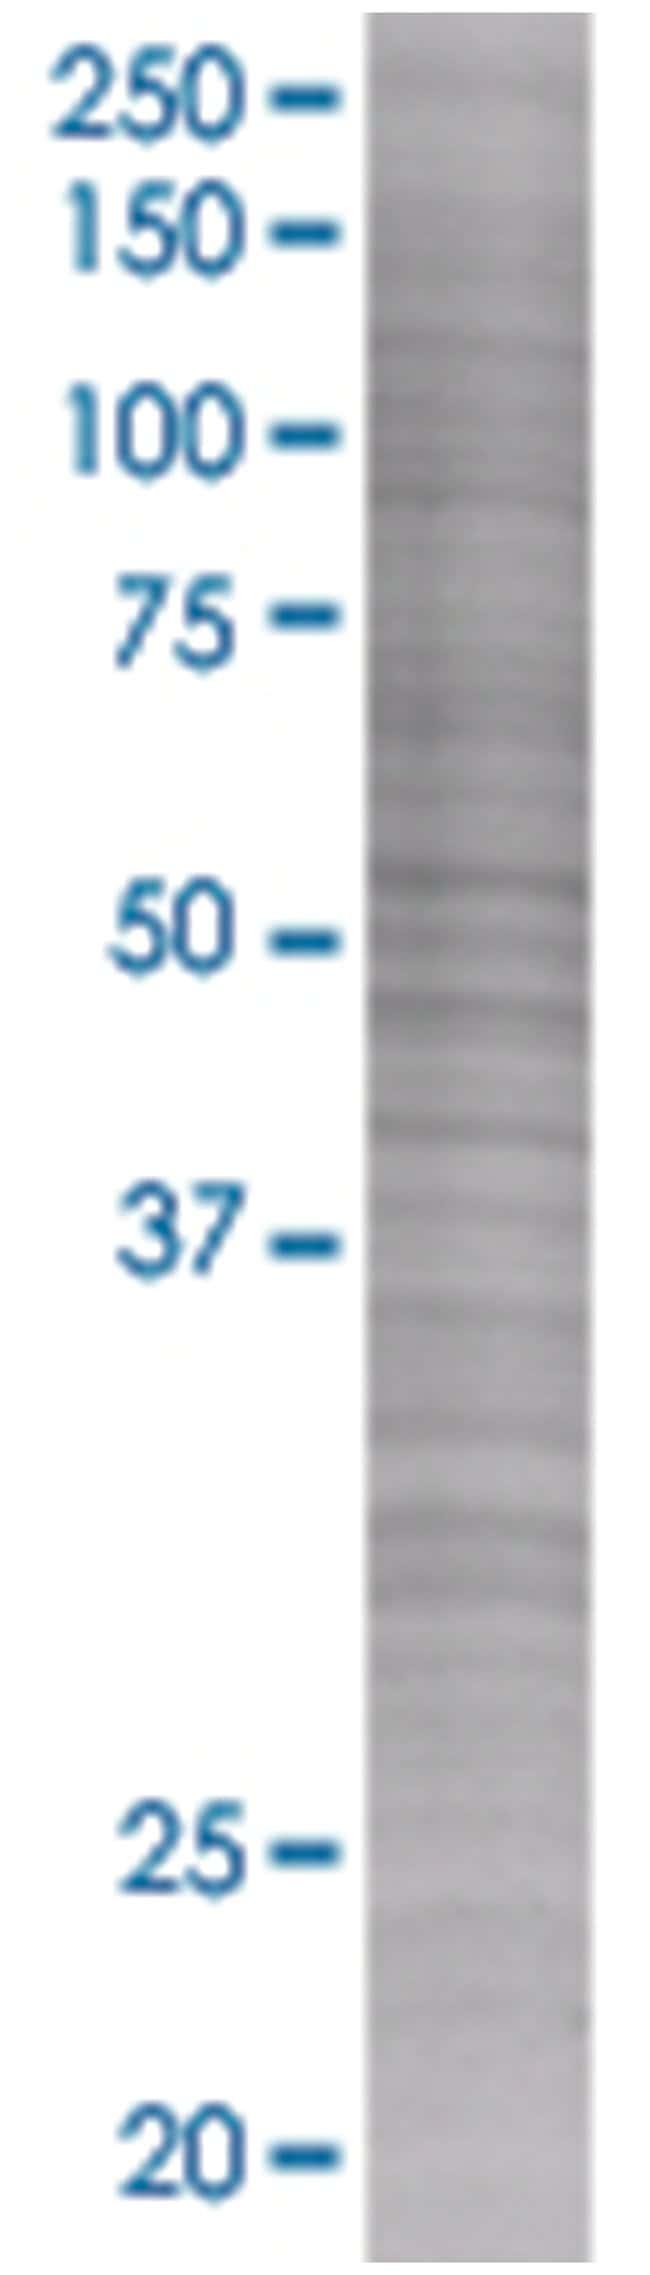 ELL3 293T Cell Overexpression Lysate (Denatured), Abnova 100µL:Life